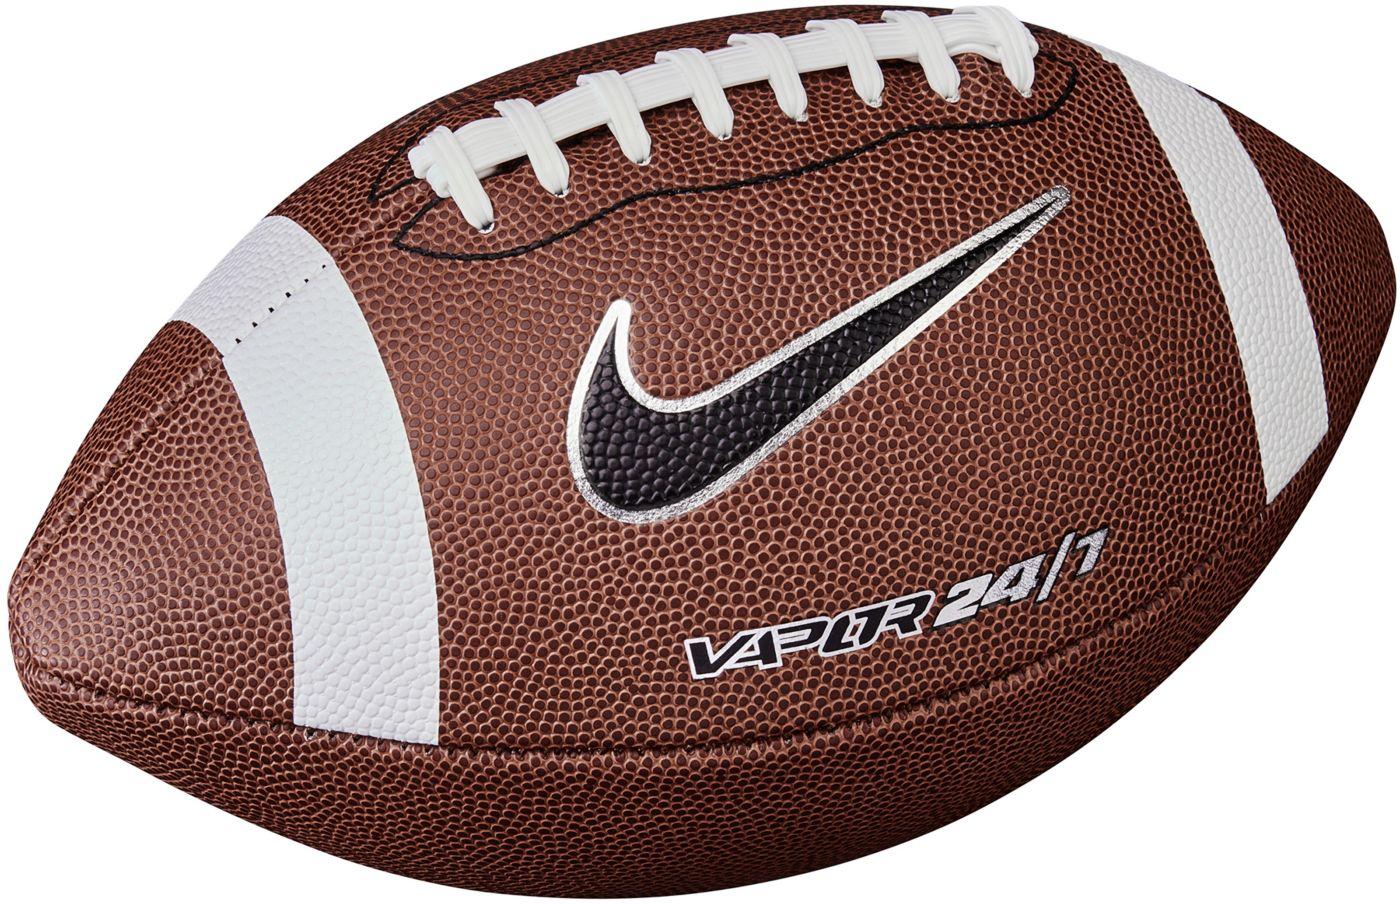 Nike Vapor 24/7 2.0 Football